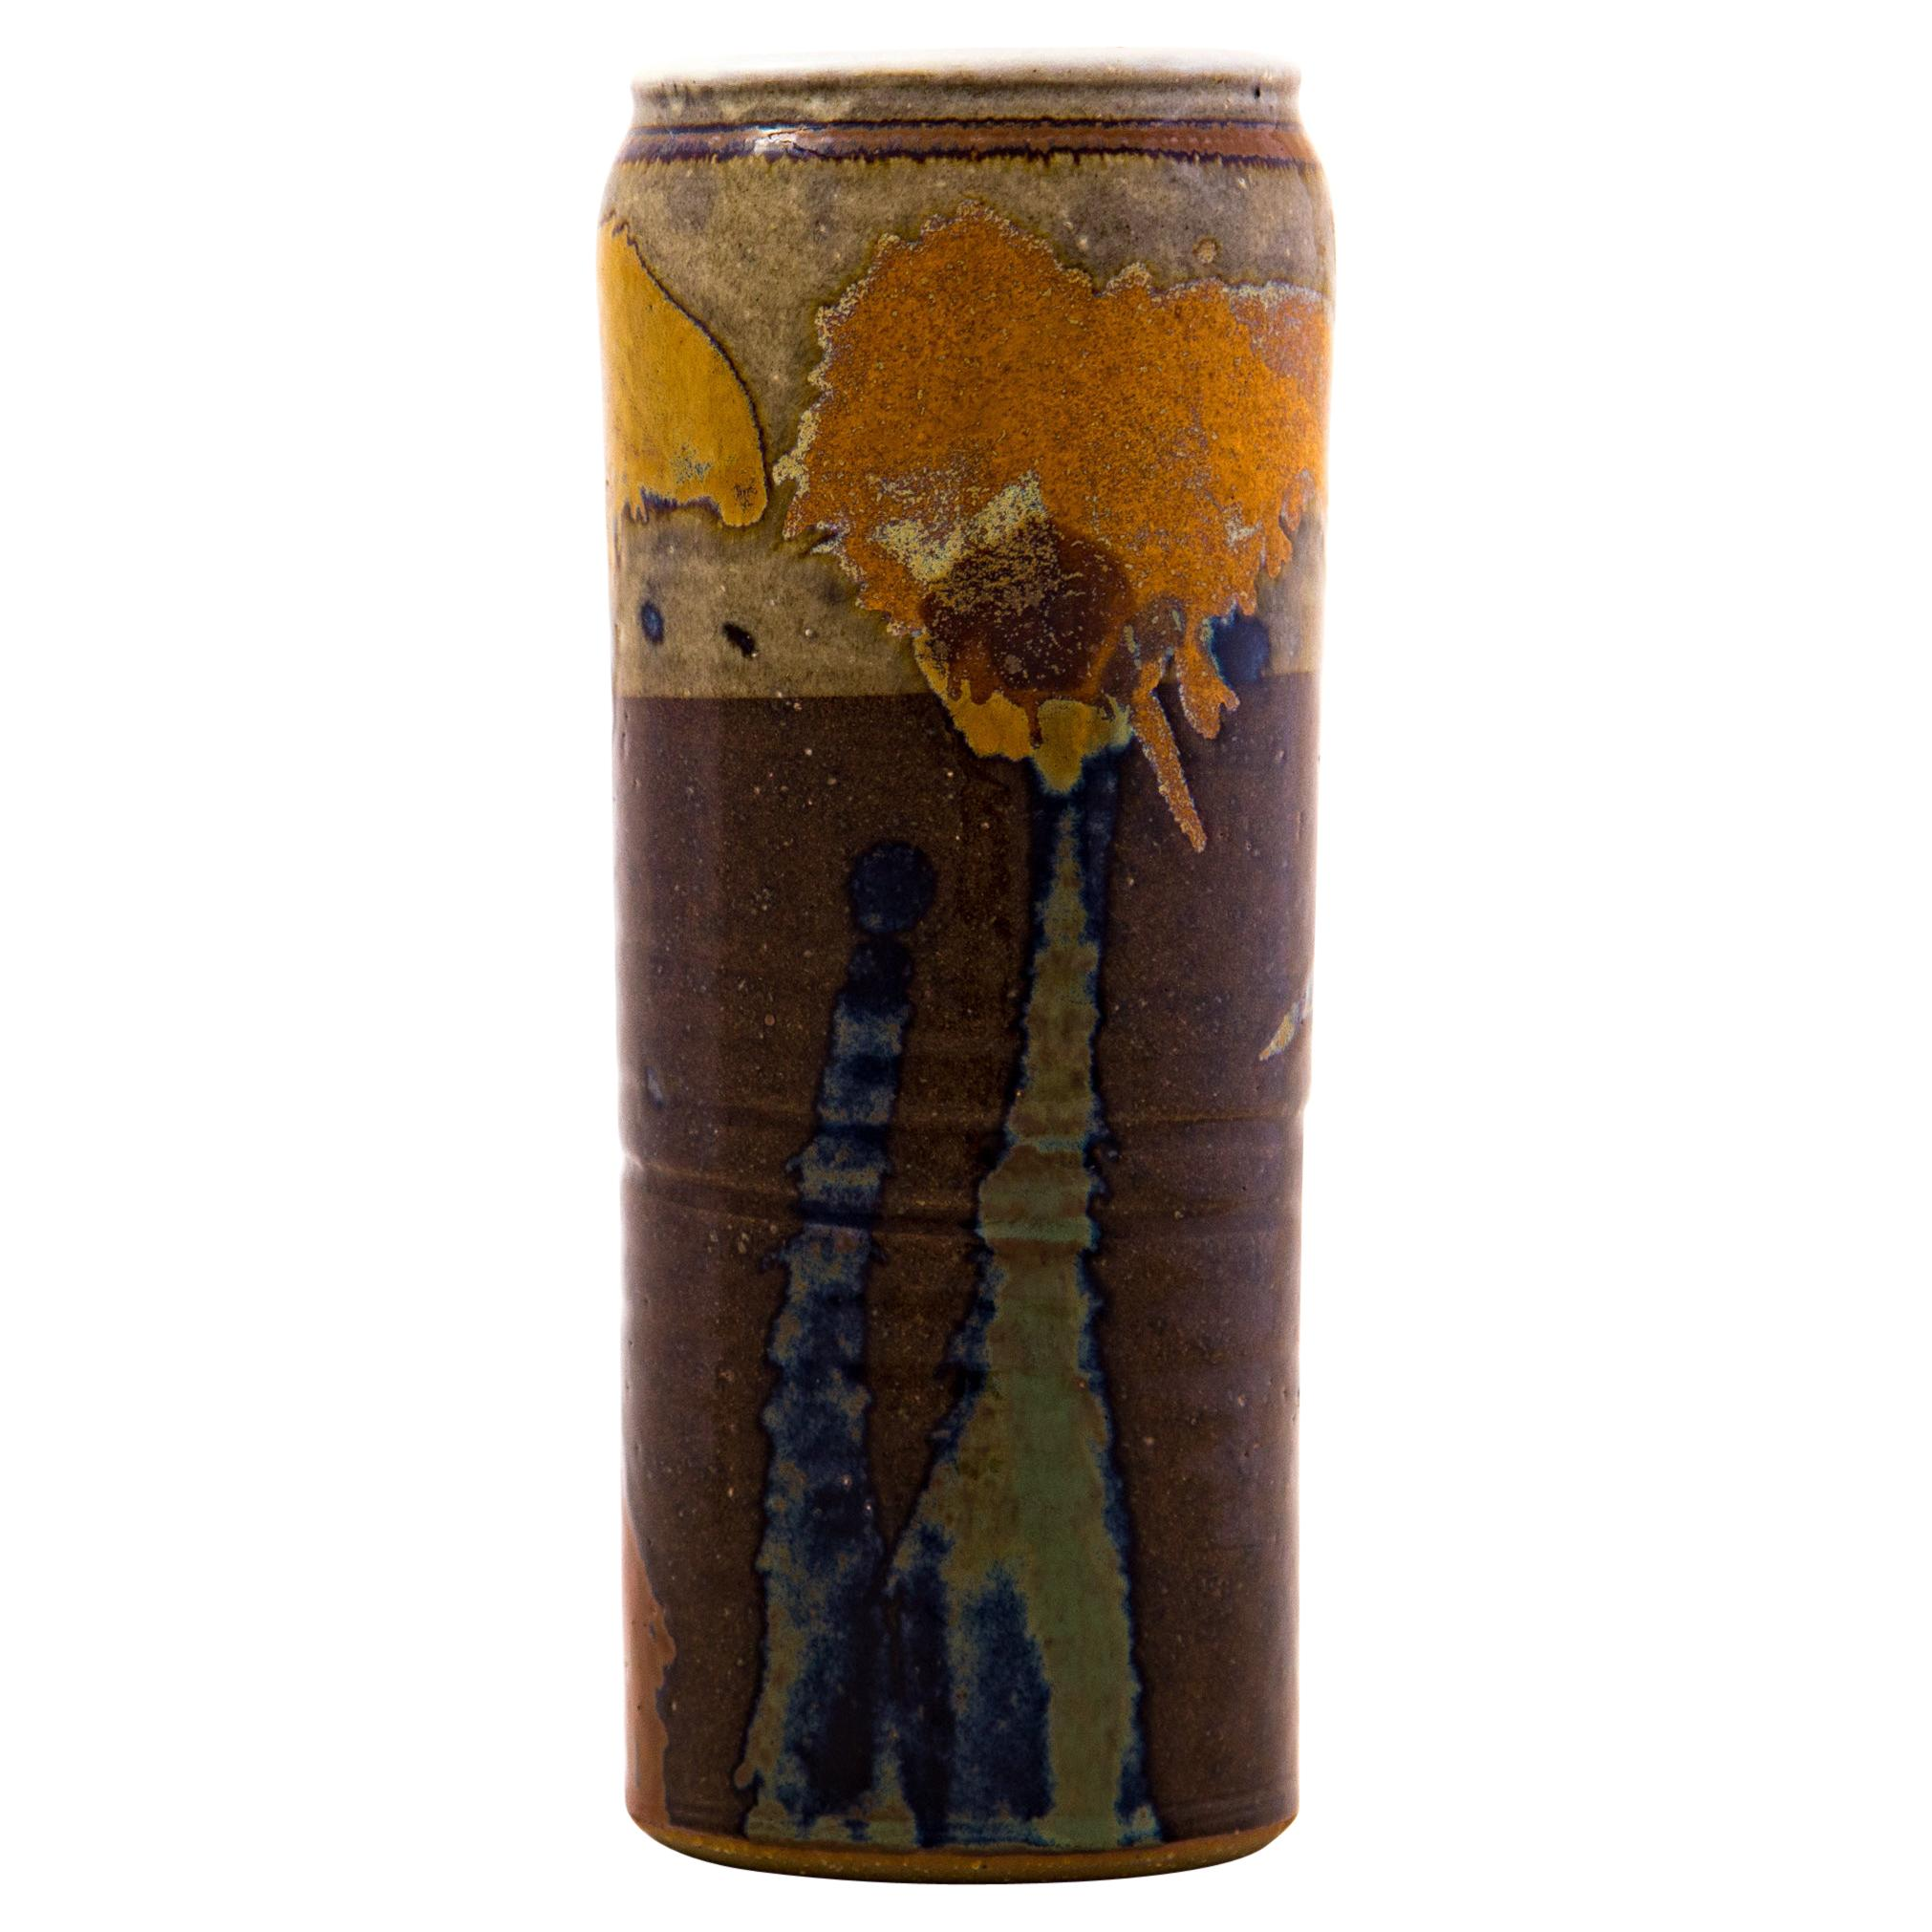 Sinclair Ashley Studio Pottery Stoneware Vase, Signed